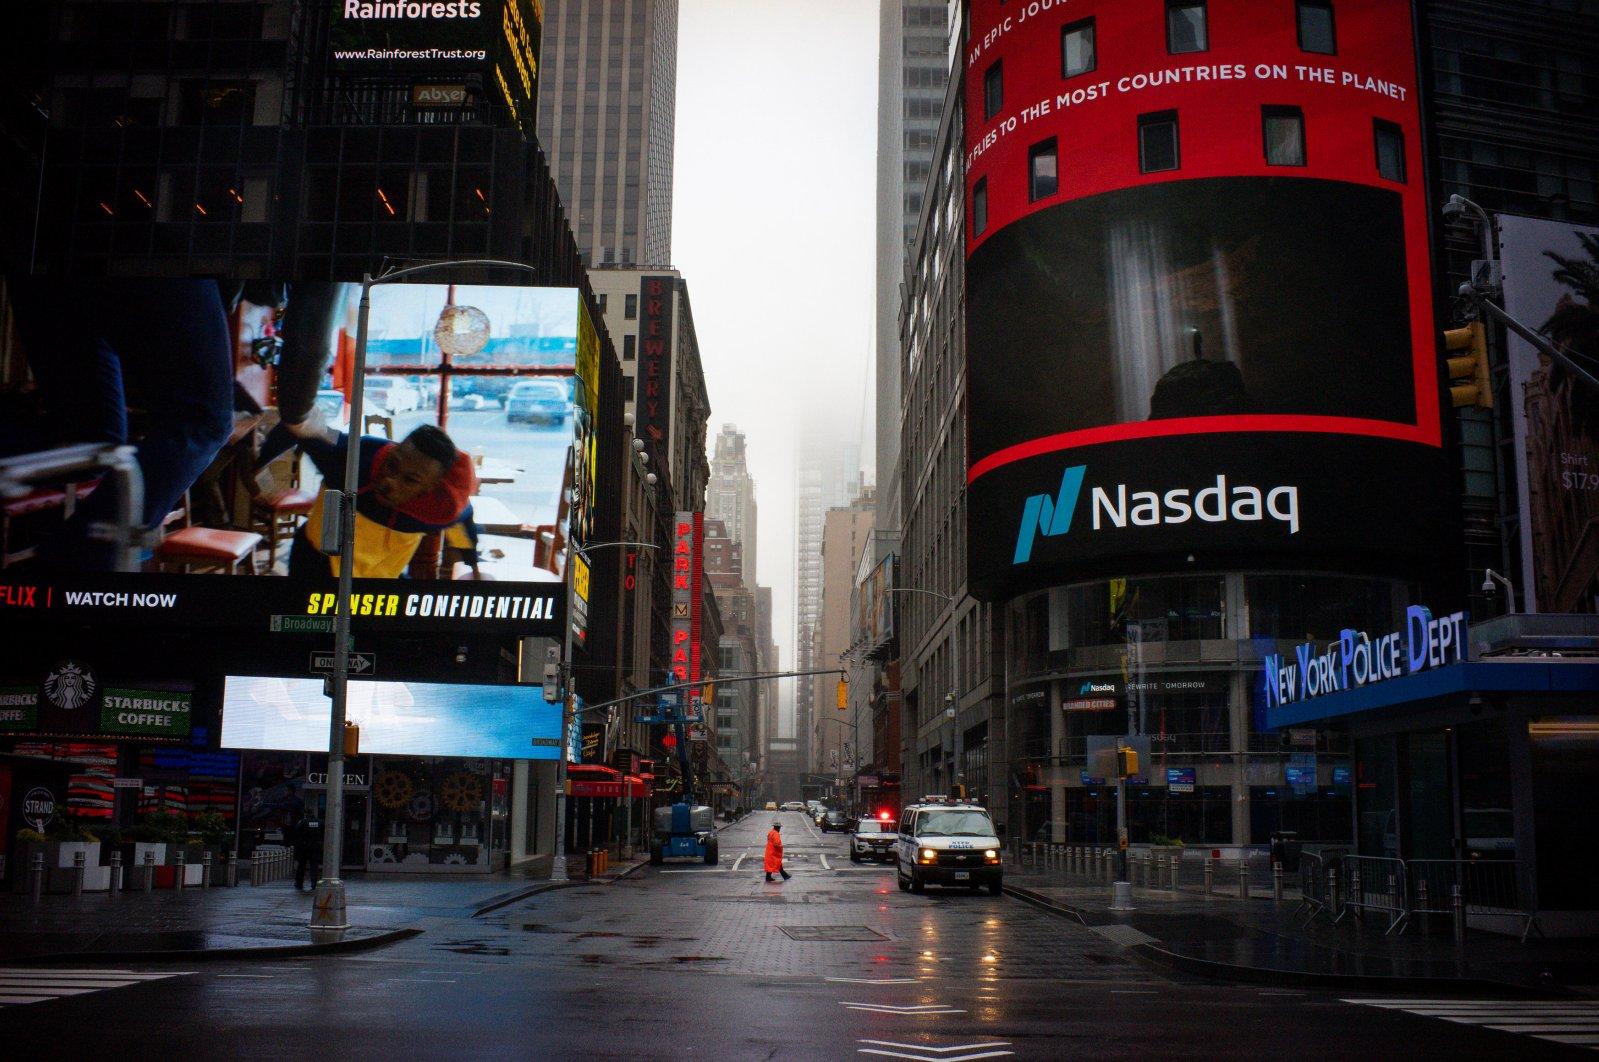 A man walks near Nasdaq MarketSite in an empty Times Square during the coronavirus outbreak in New York City, U.S., March 29, 2020. (Reuters Photo)